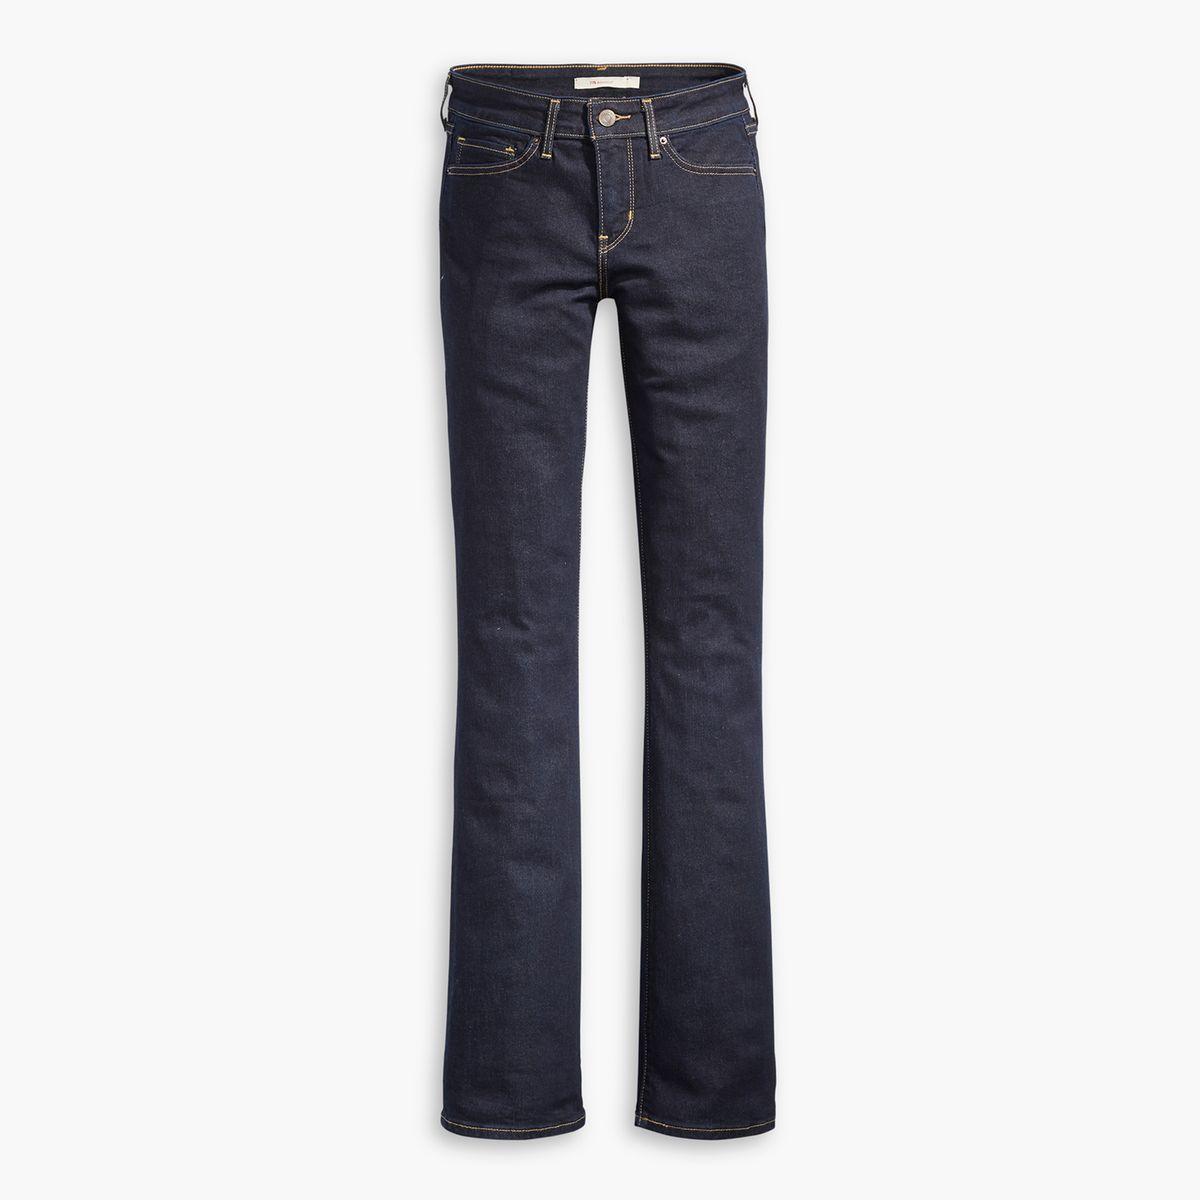 latest design authentic quality new authentic Jean 715® Bootcut - Taille : W24/L32;W25/L30;W25/L32;W26/L30 ...